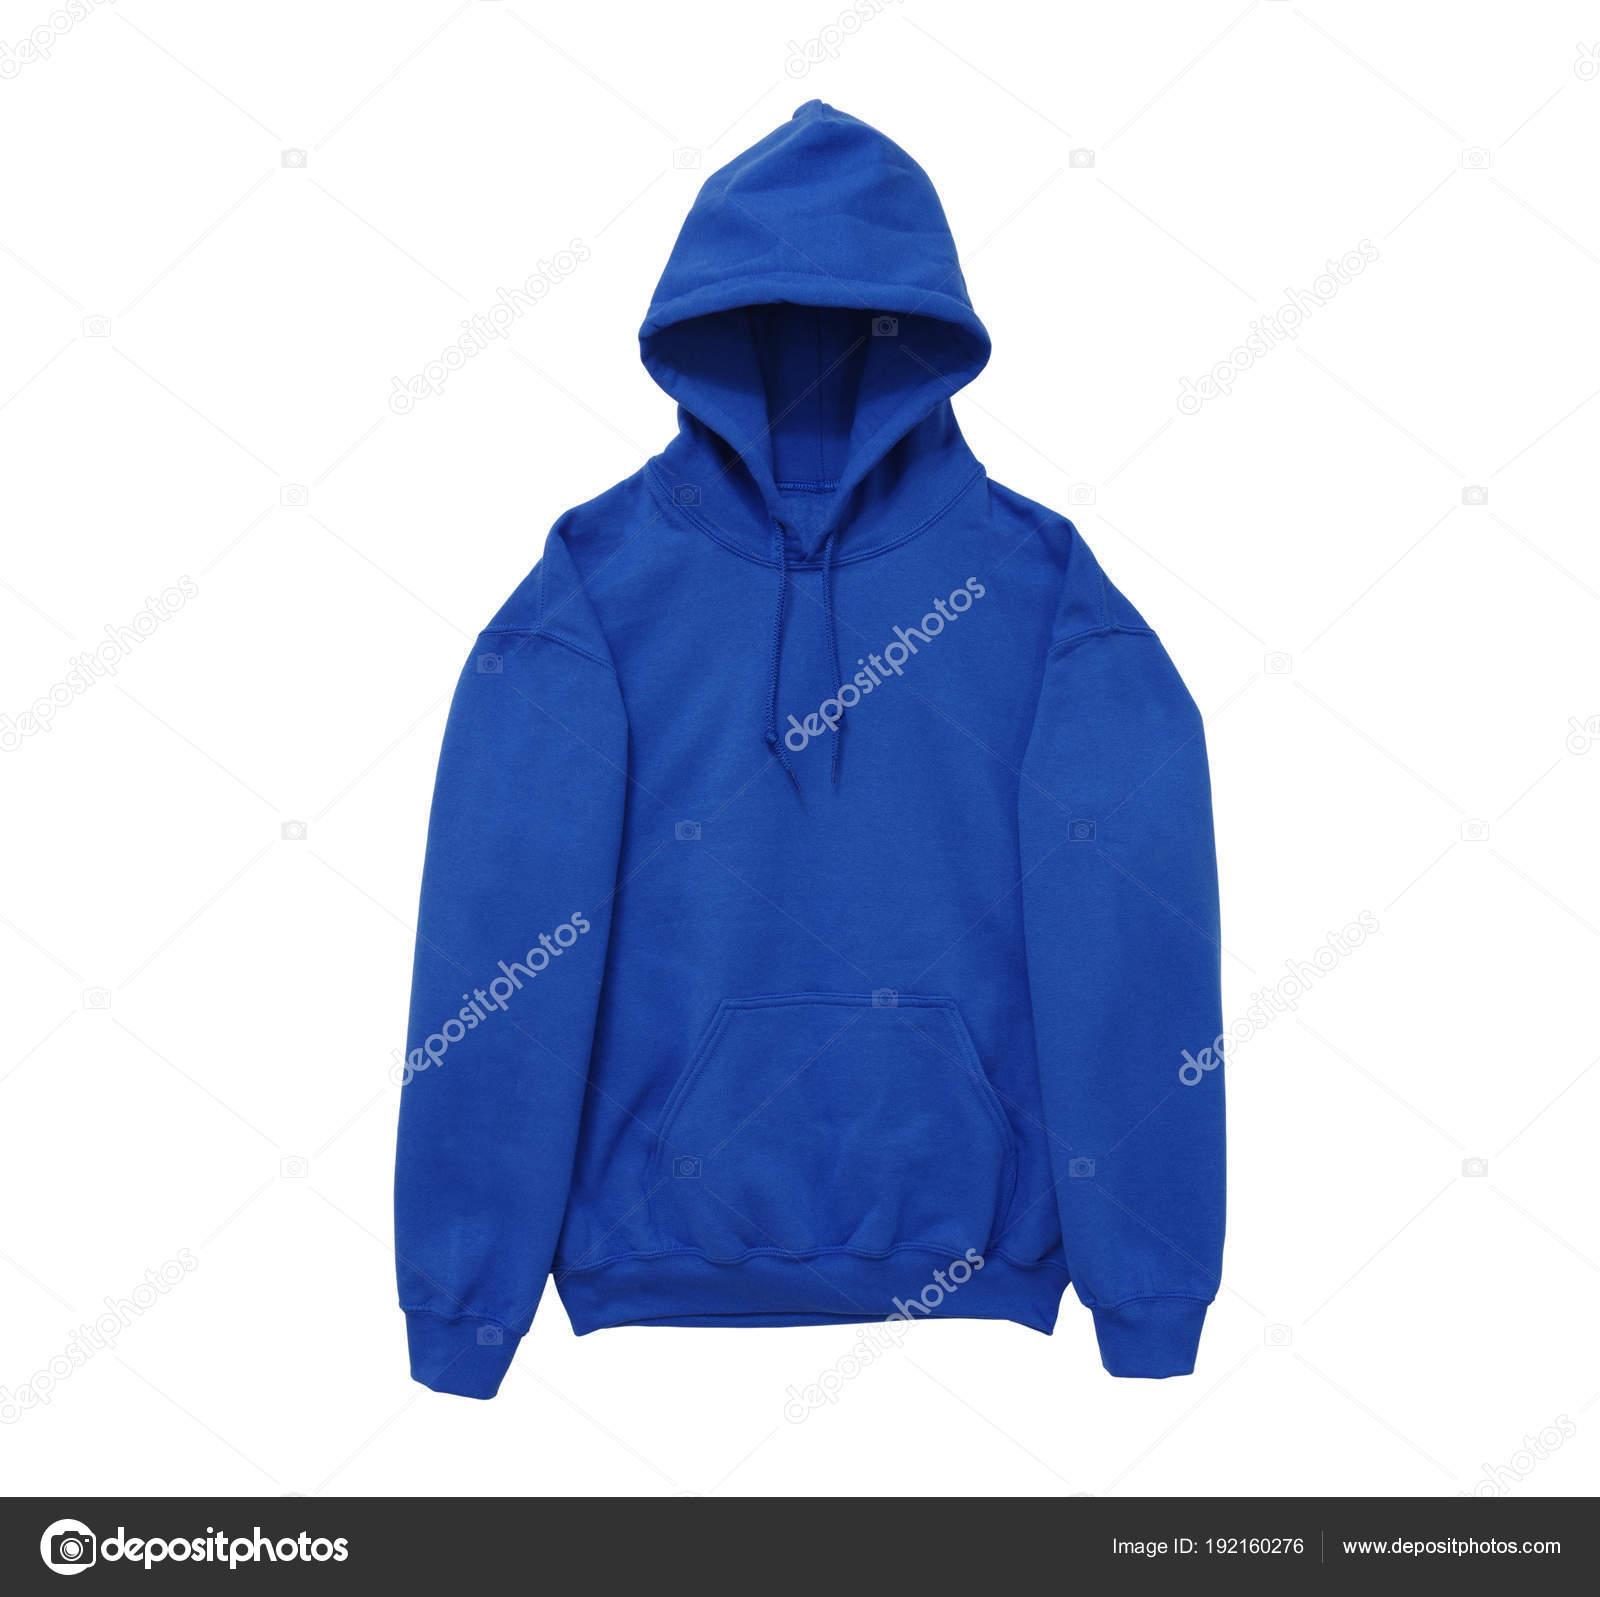 dbe2b78dd0d5 Κενό Hoodie Φούτερ Χρώμα Μπλε Προβολή Μέτωπο Βραχίονα Λευκό Φόντο ...